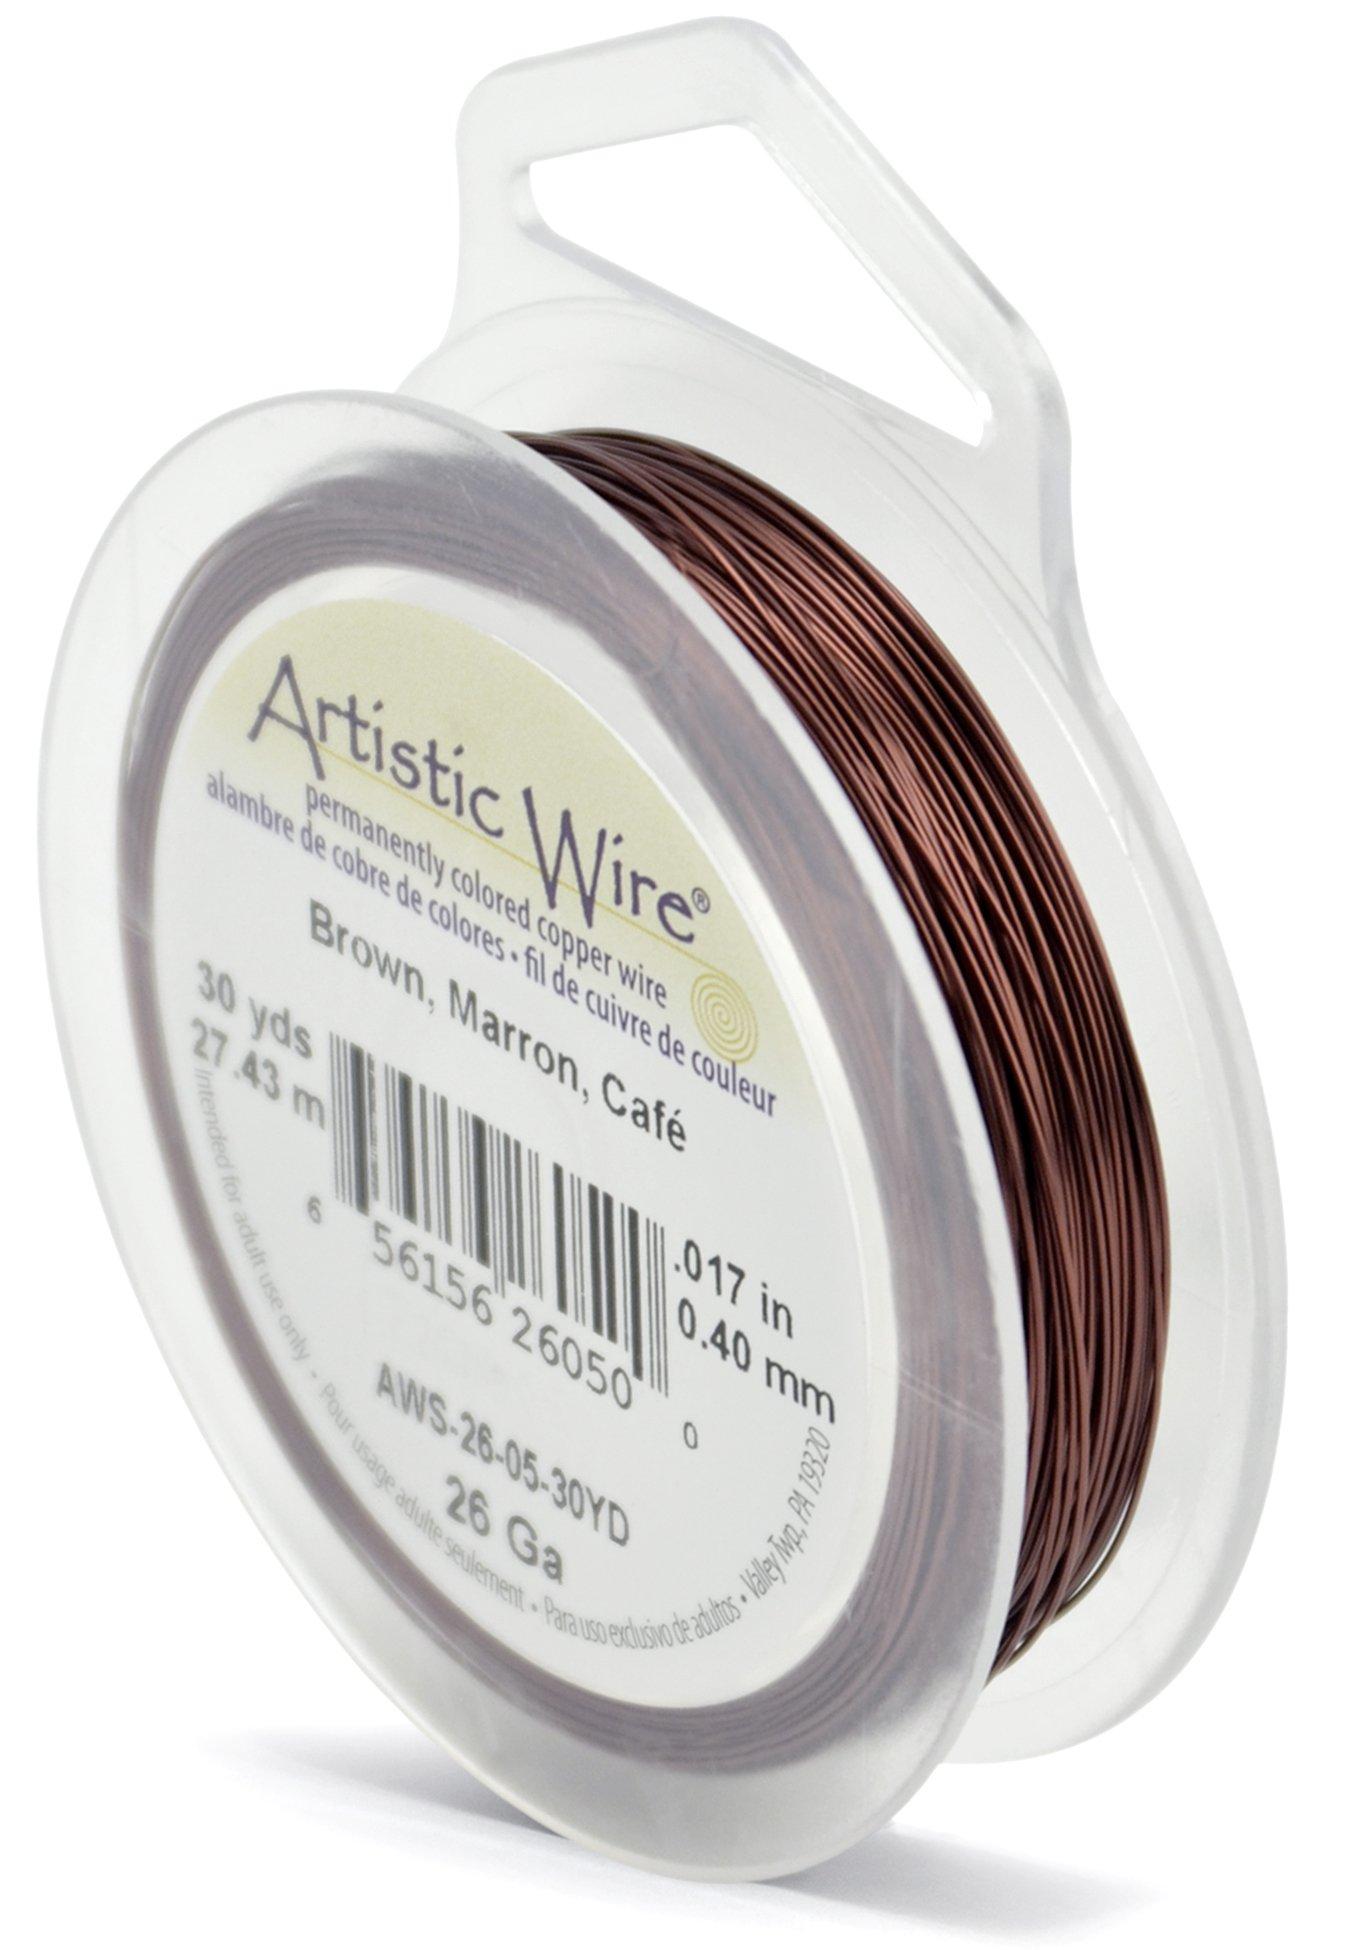 Beadalon Artistic, 26 Gauge, Brown Color, 30 yd (27.4 m) Craft Wire